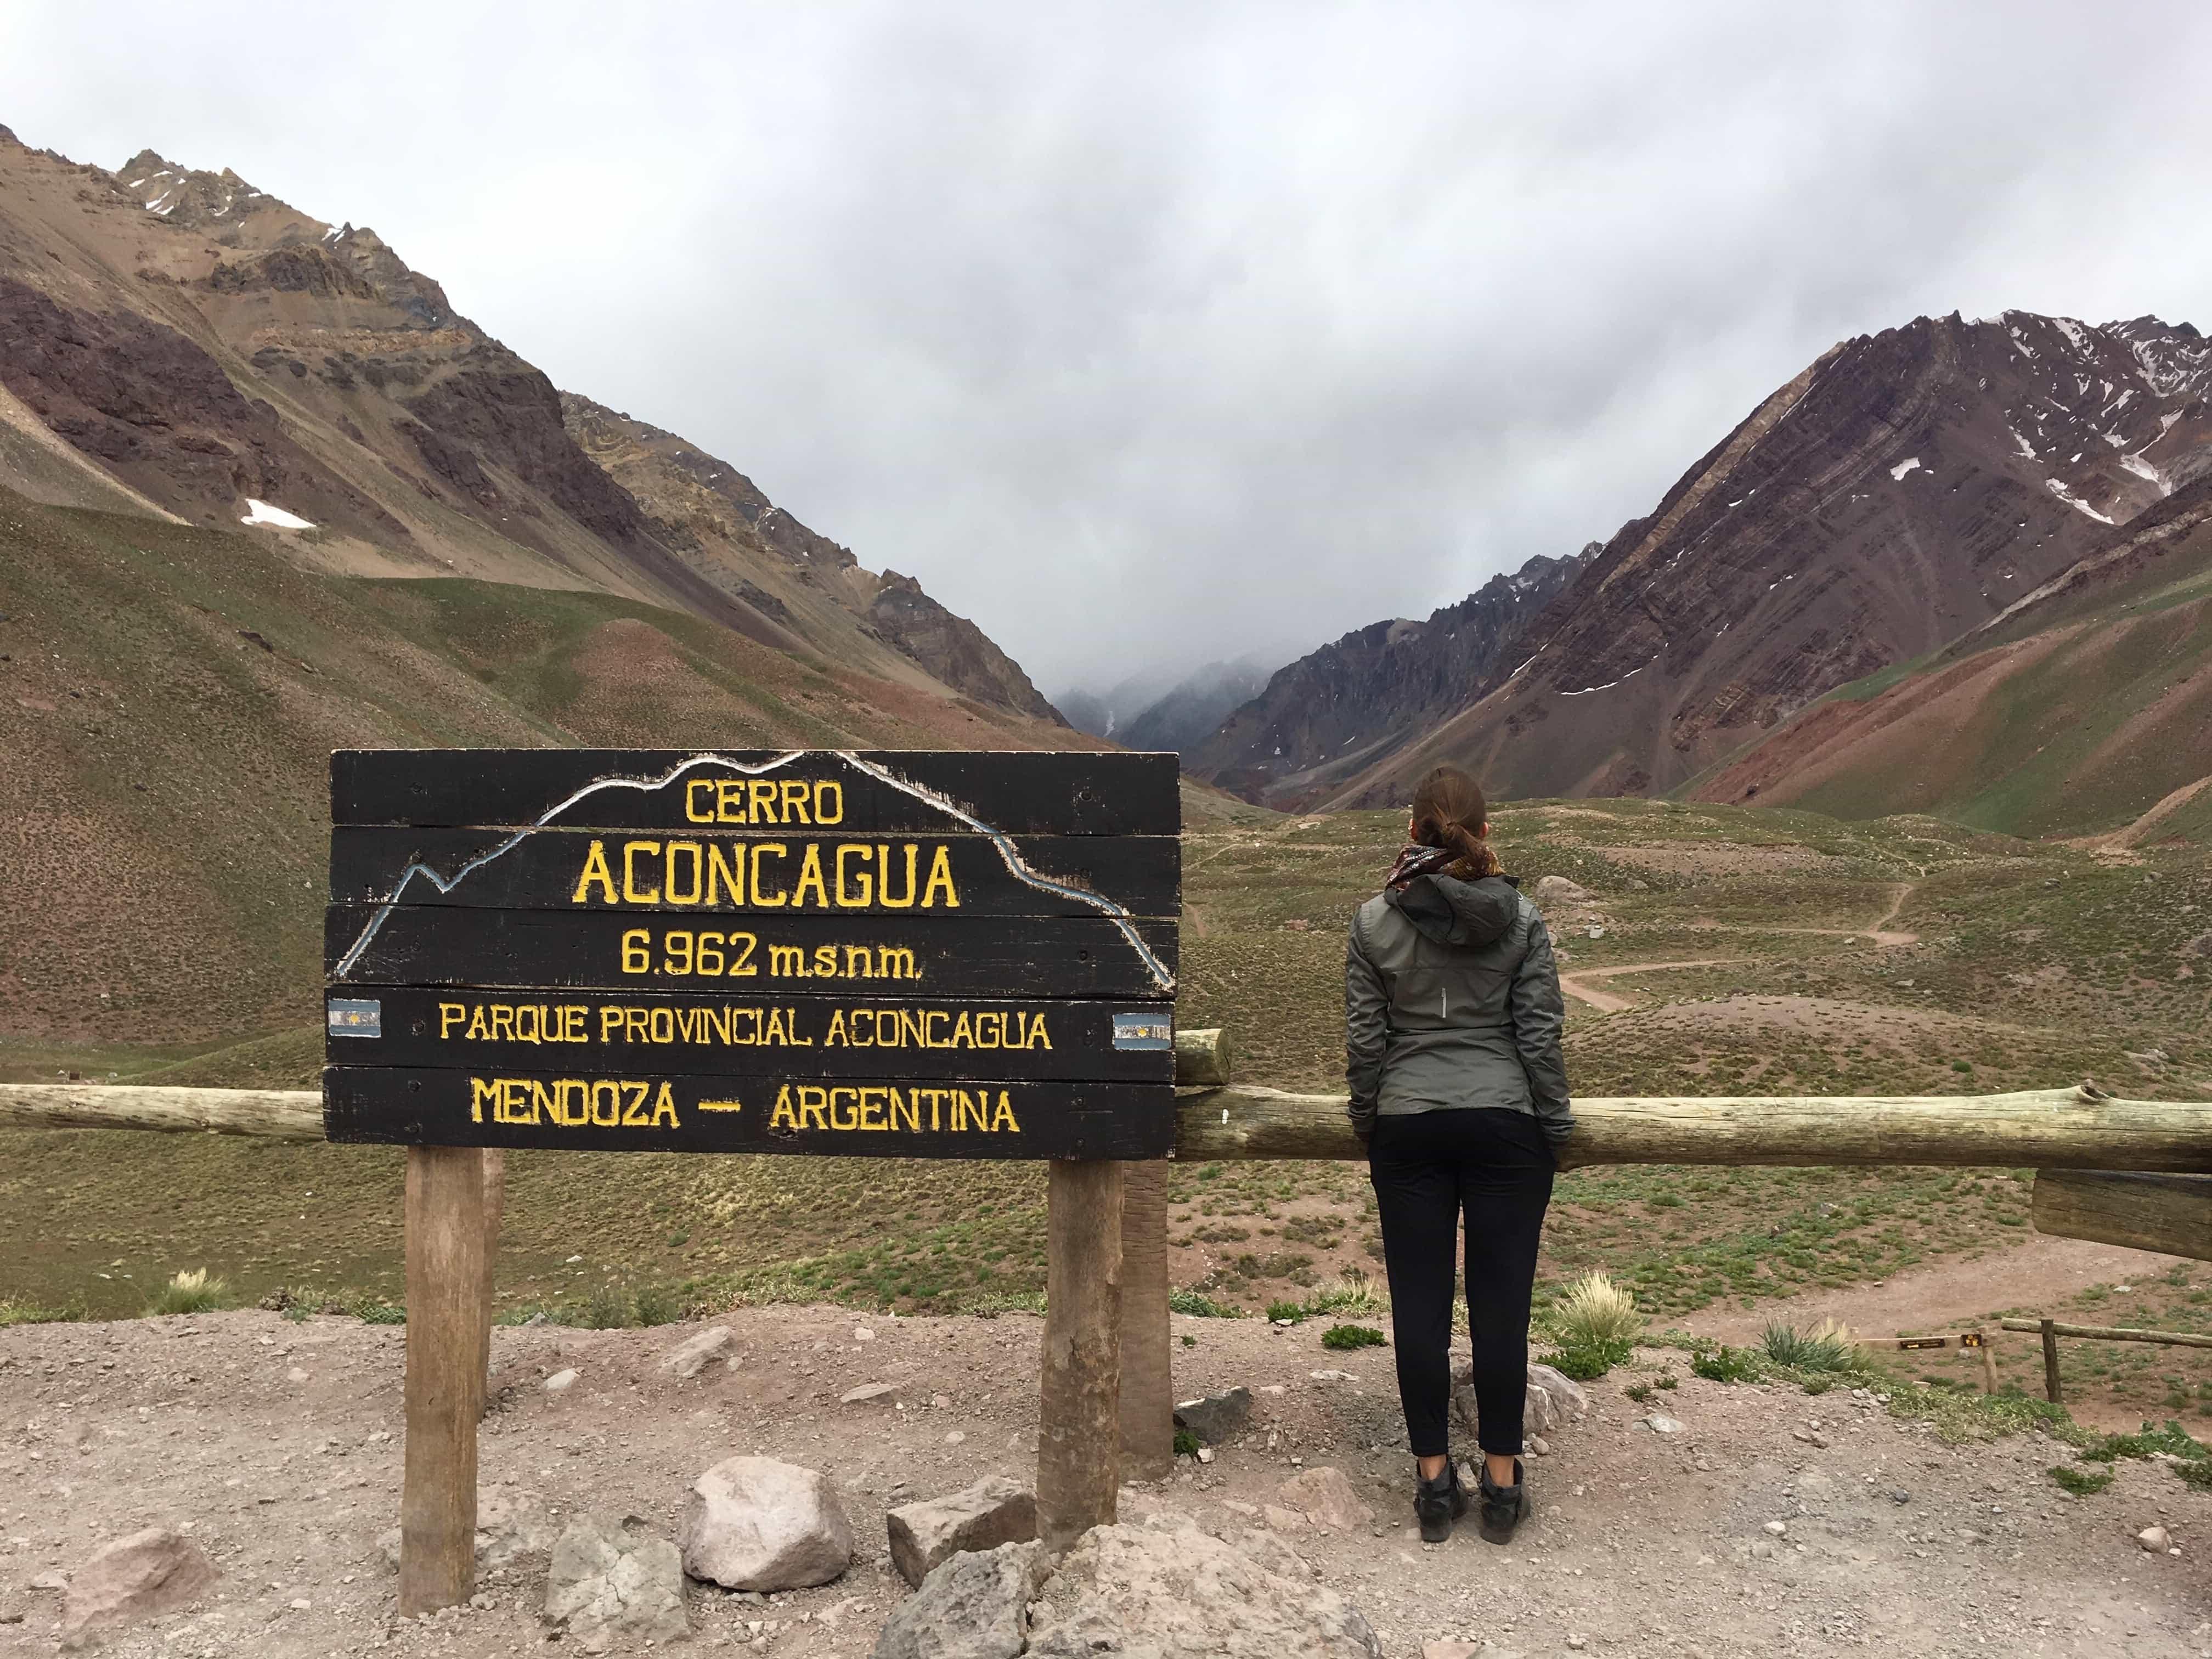 Kelsey in Mendoza, Argentina